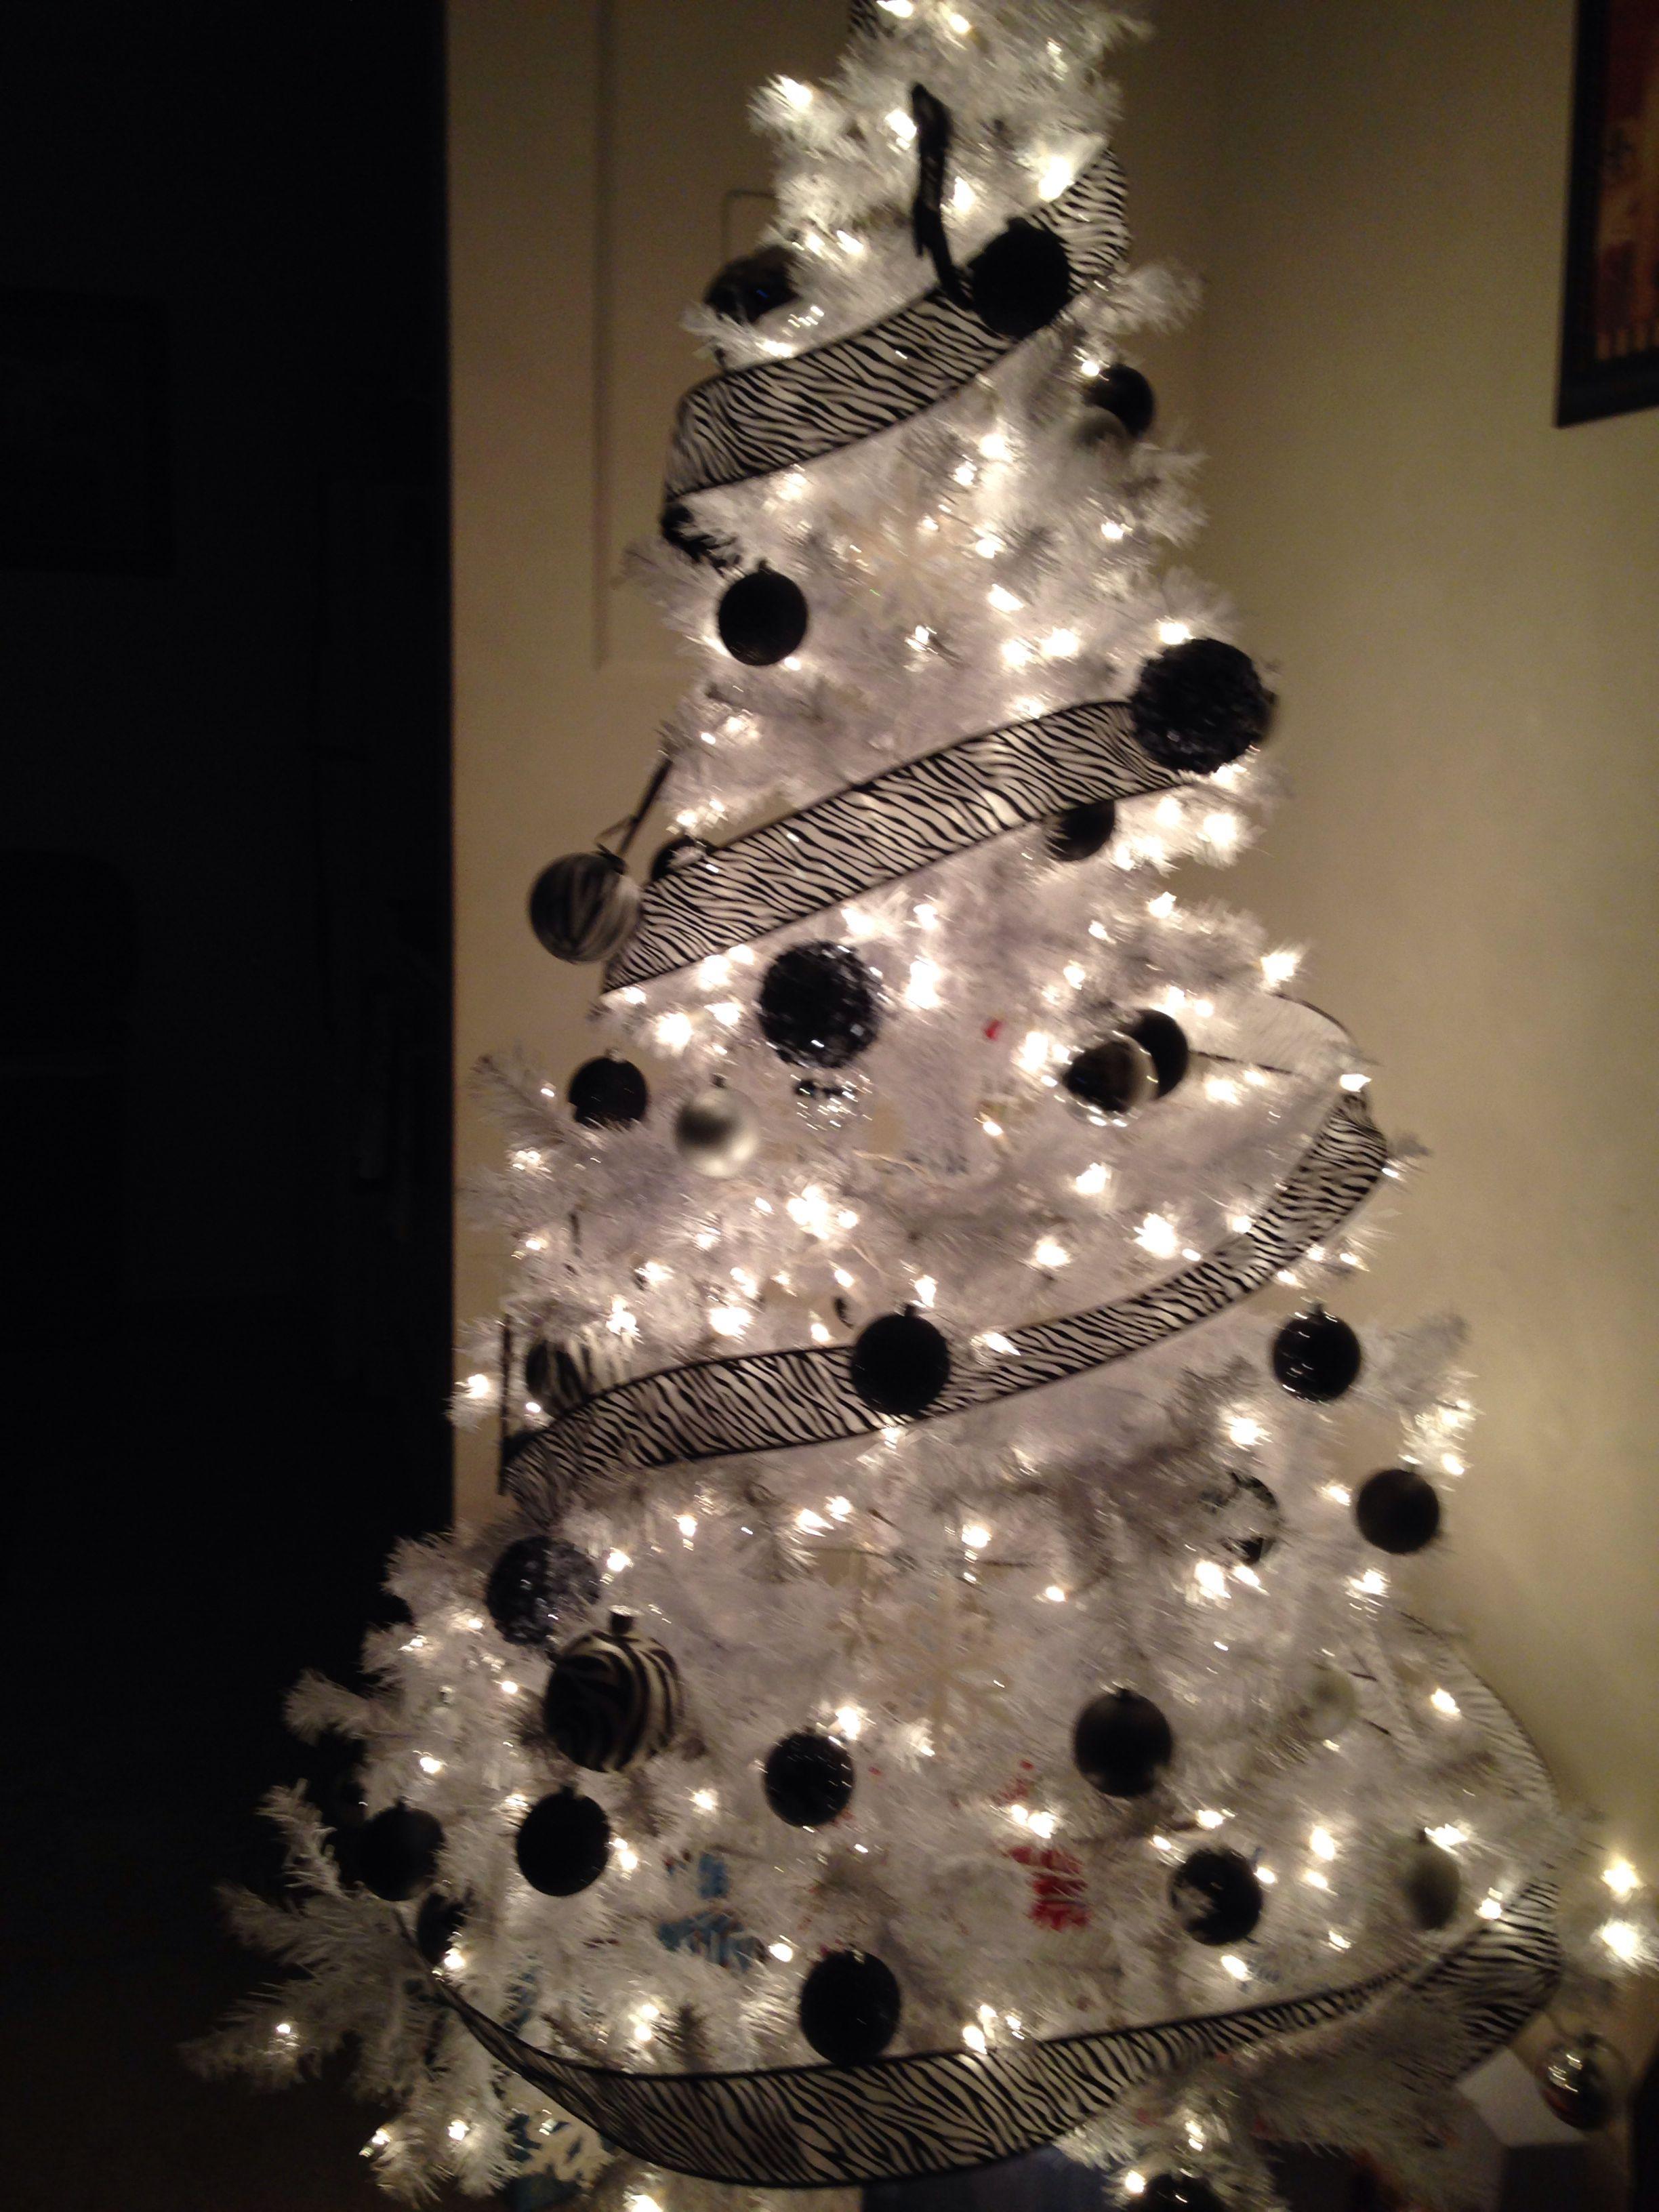 Zebra Themed Christmas Tree Christmas Tree Themes Holiday Christmas Tree Christmas Tree